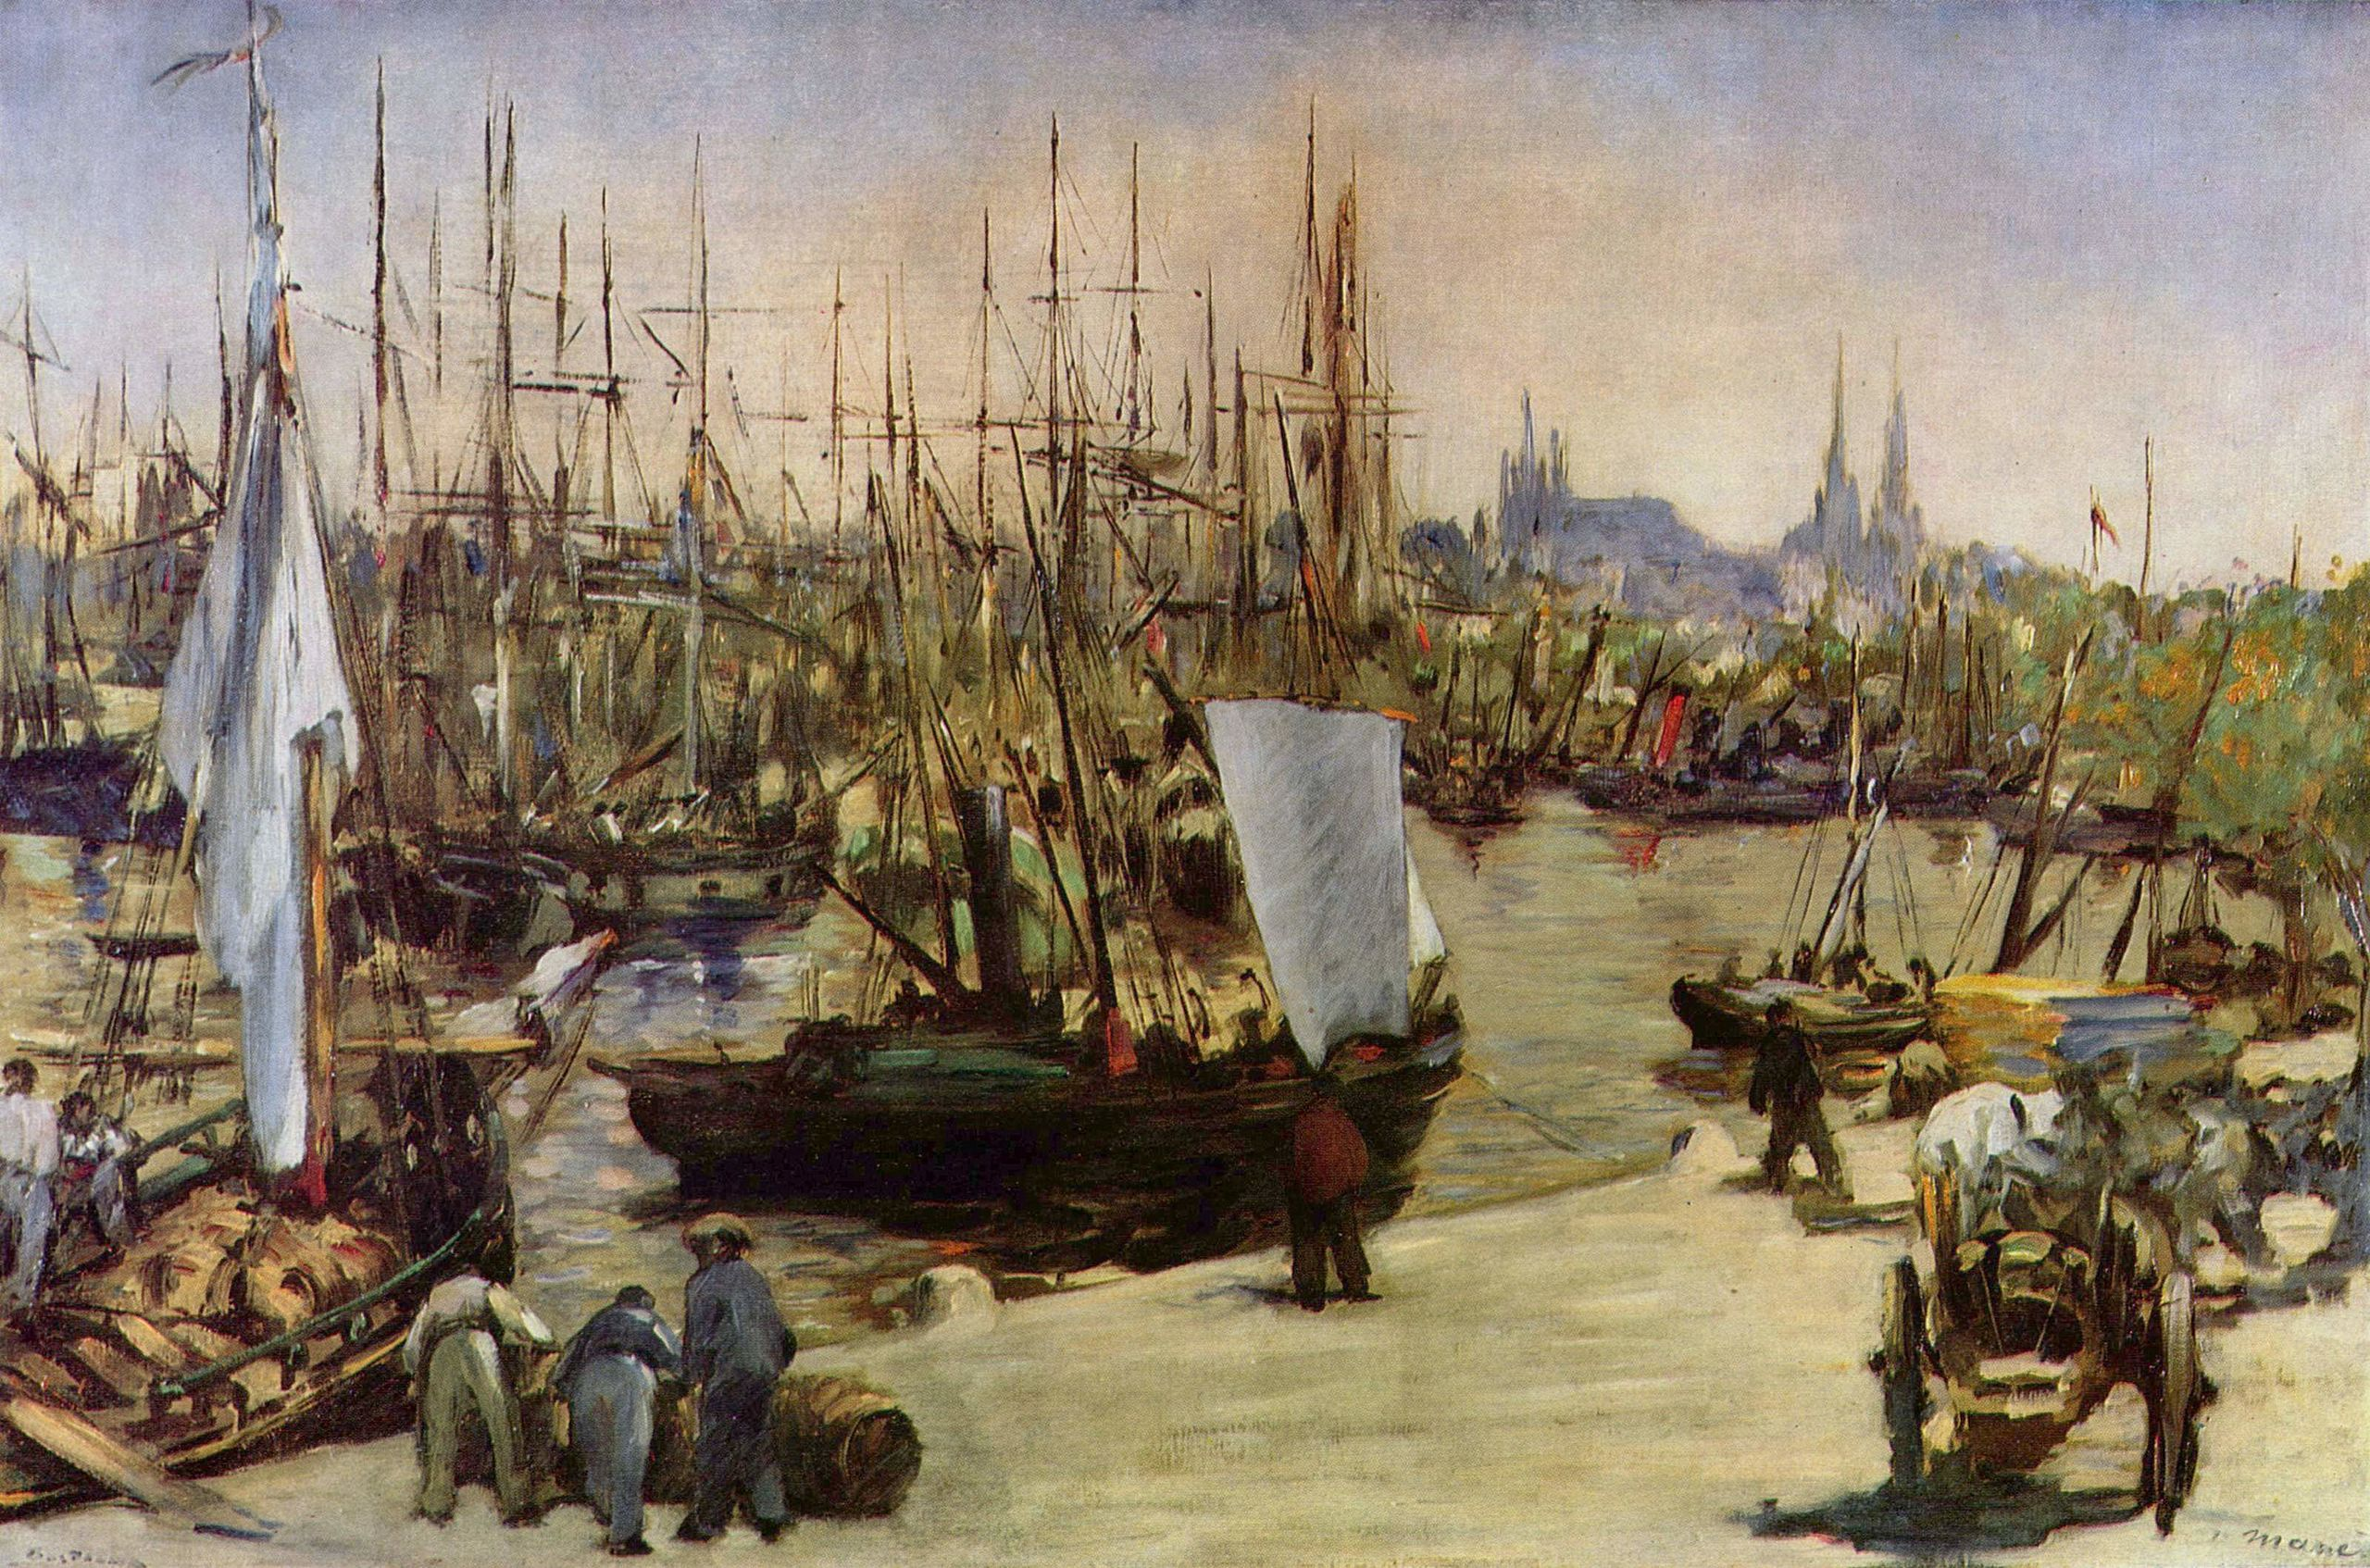 Edouard Manet 026.jpg